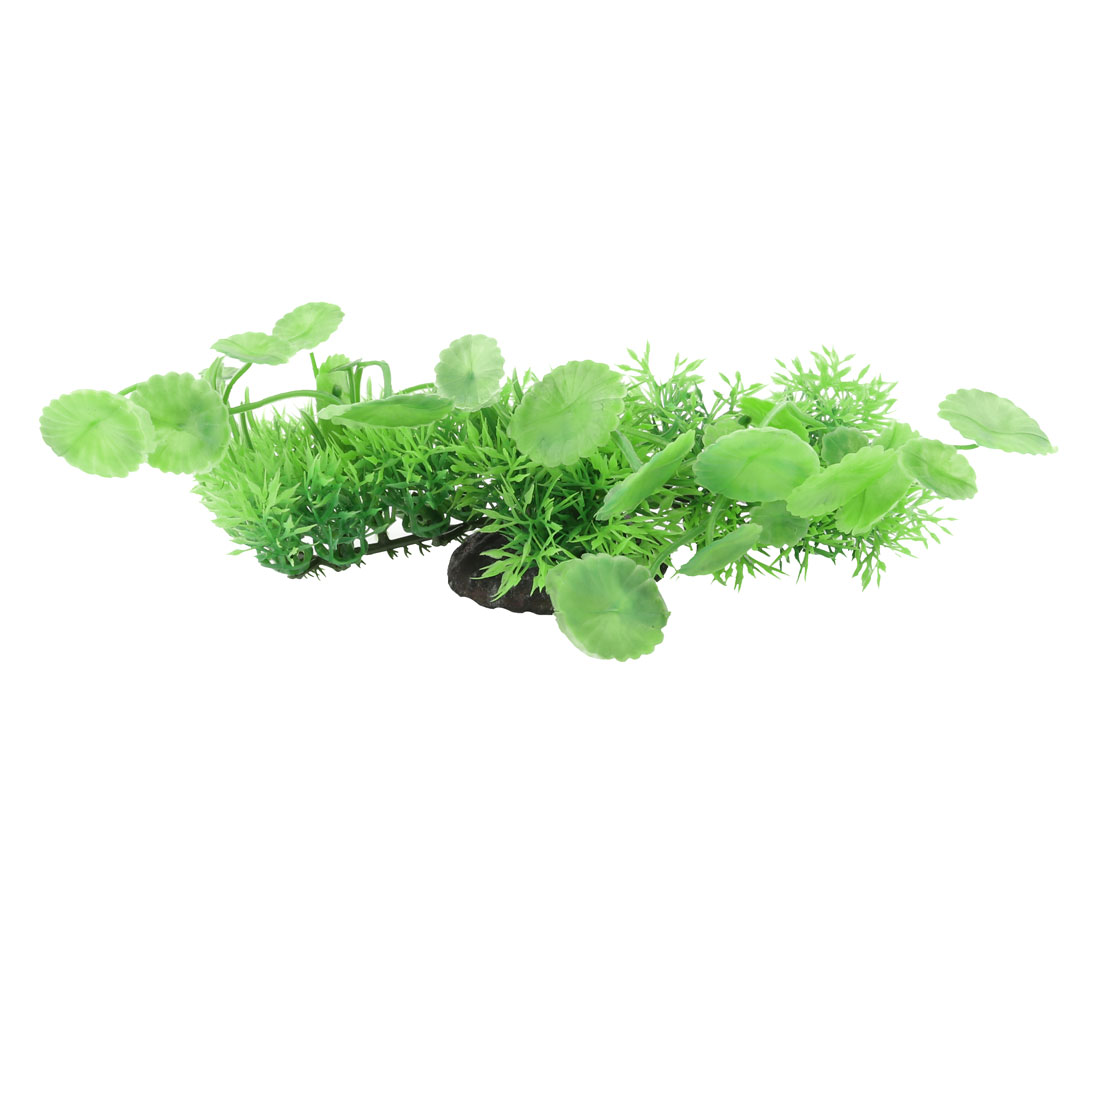 Aquarium Fish Tank Artificial Fake Plastic Water Plant Grass Decor Green 8cm Height